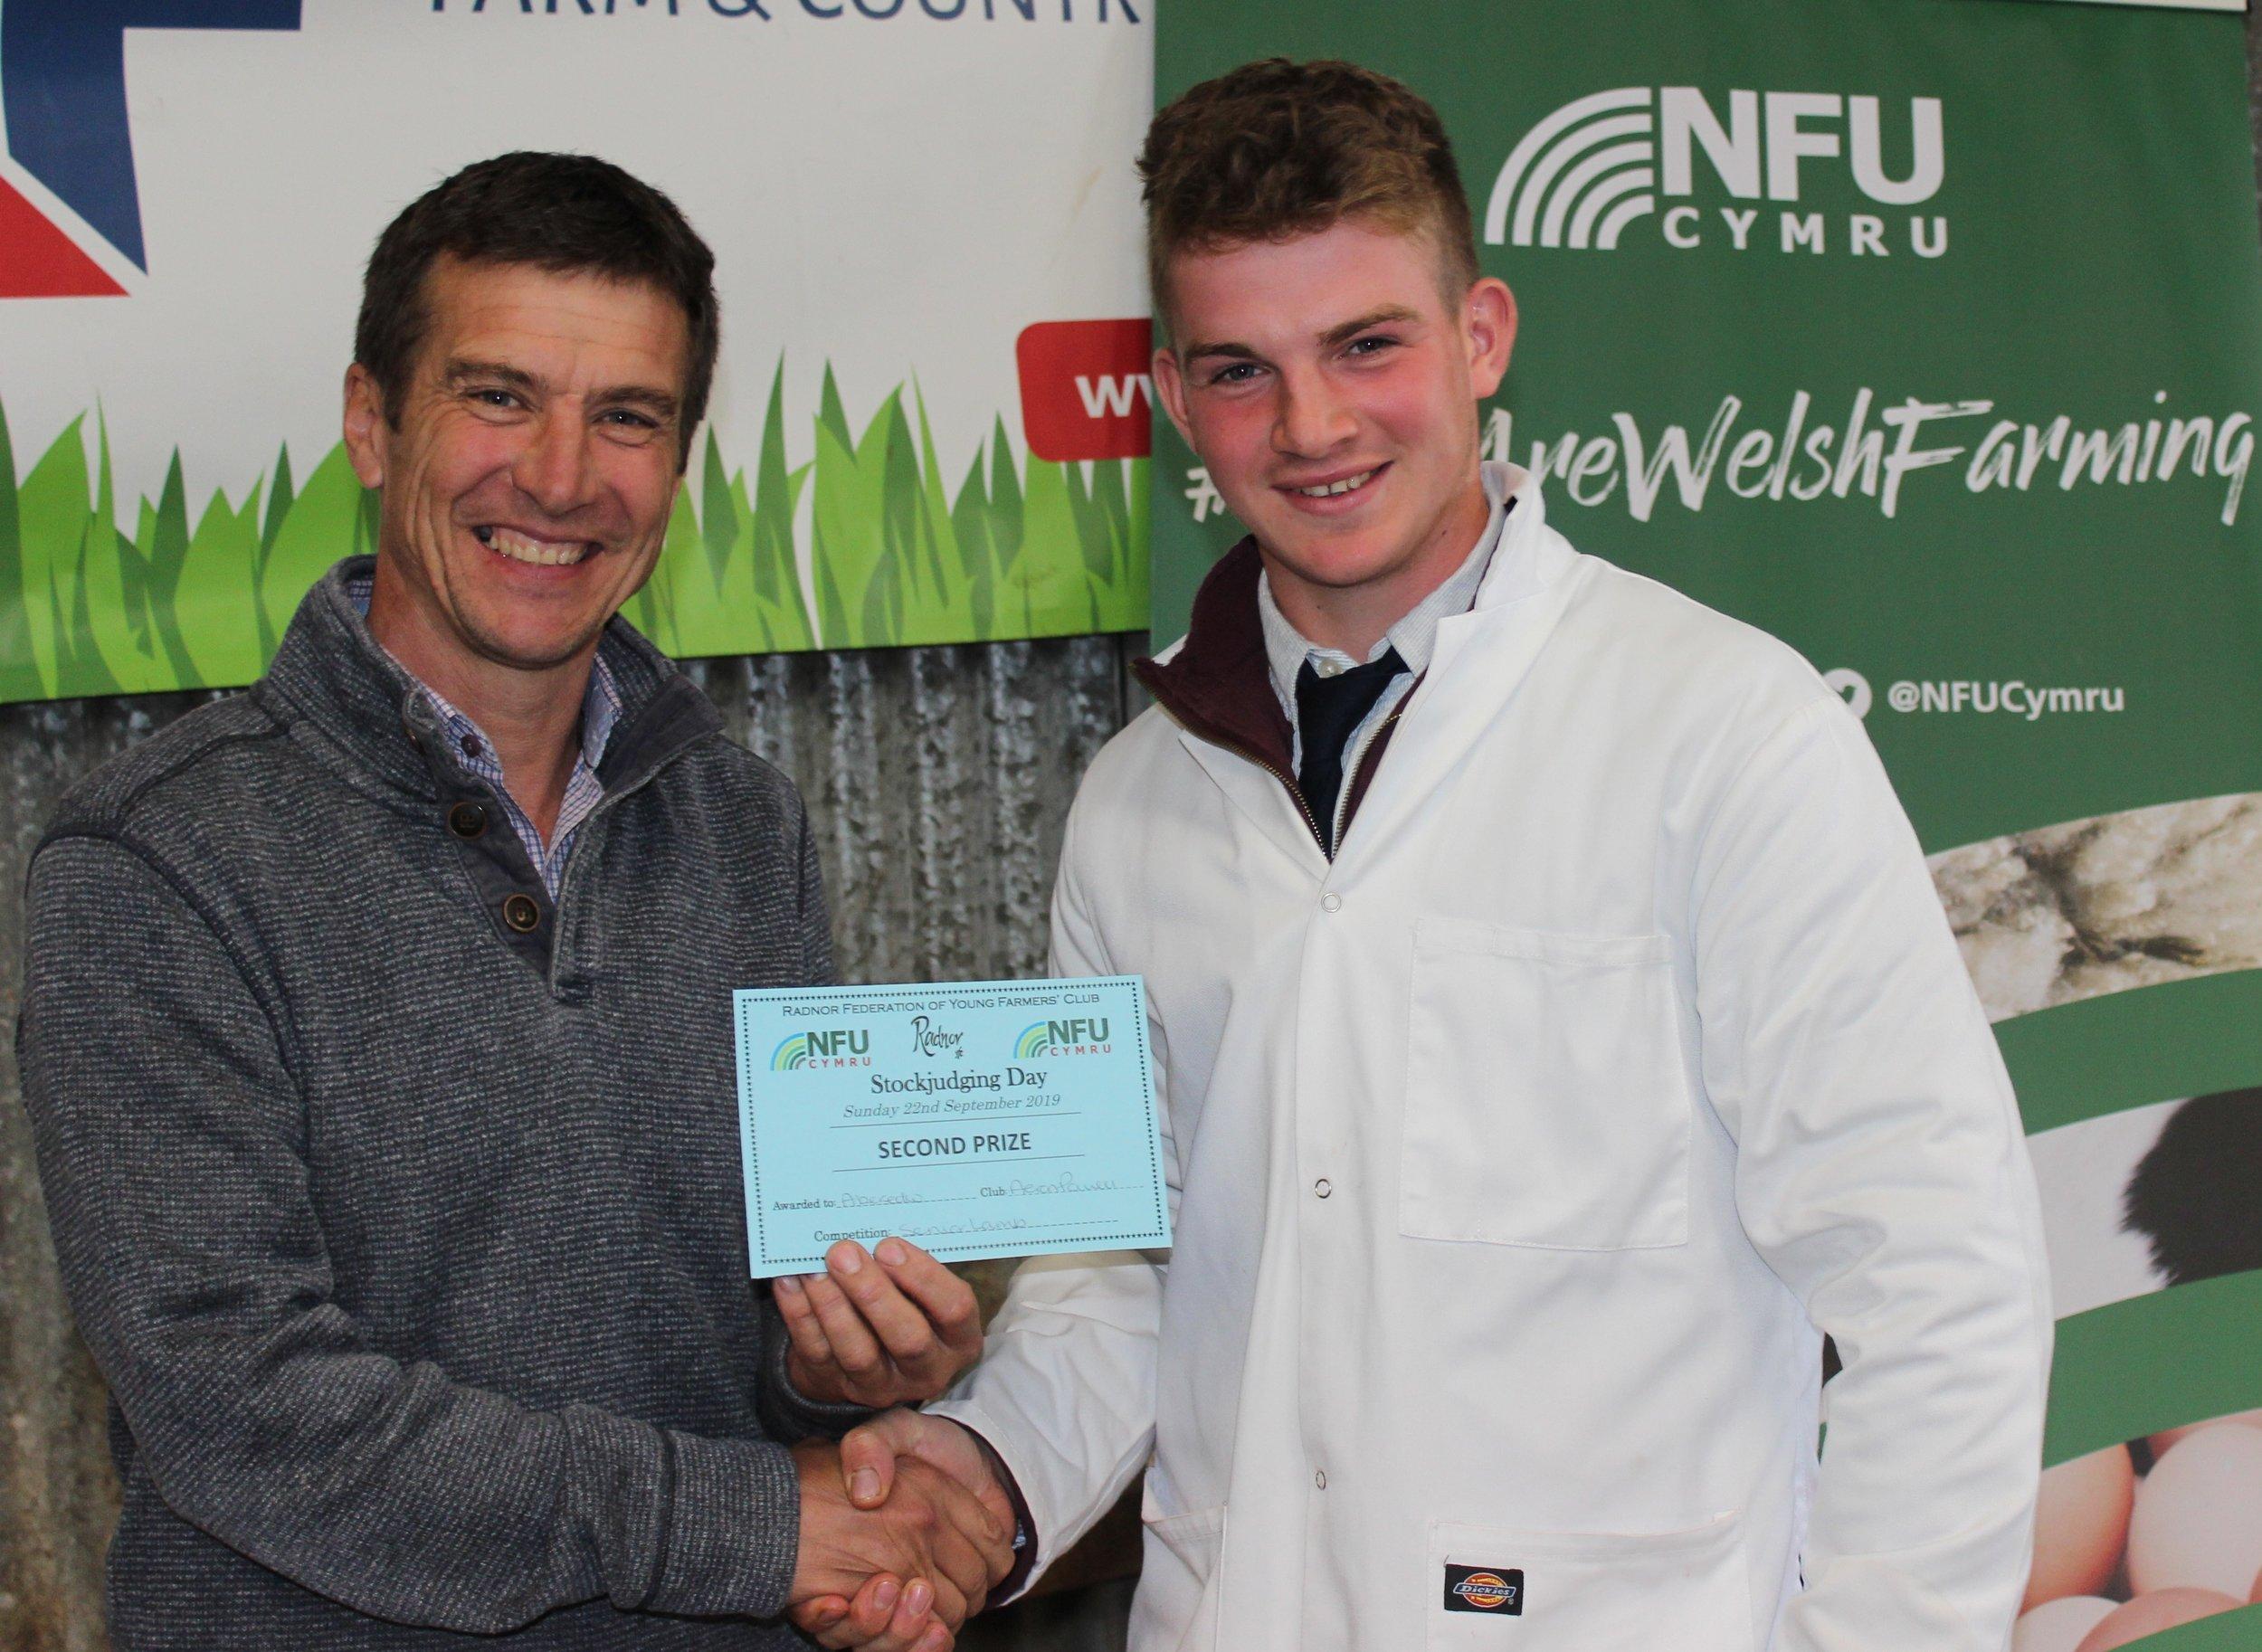 Aeron Powell, Aberedw YFC - joint 2nd place int he Senior Lamb with Mark Watson.